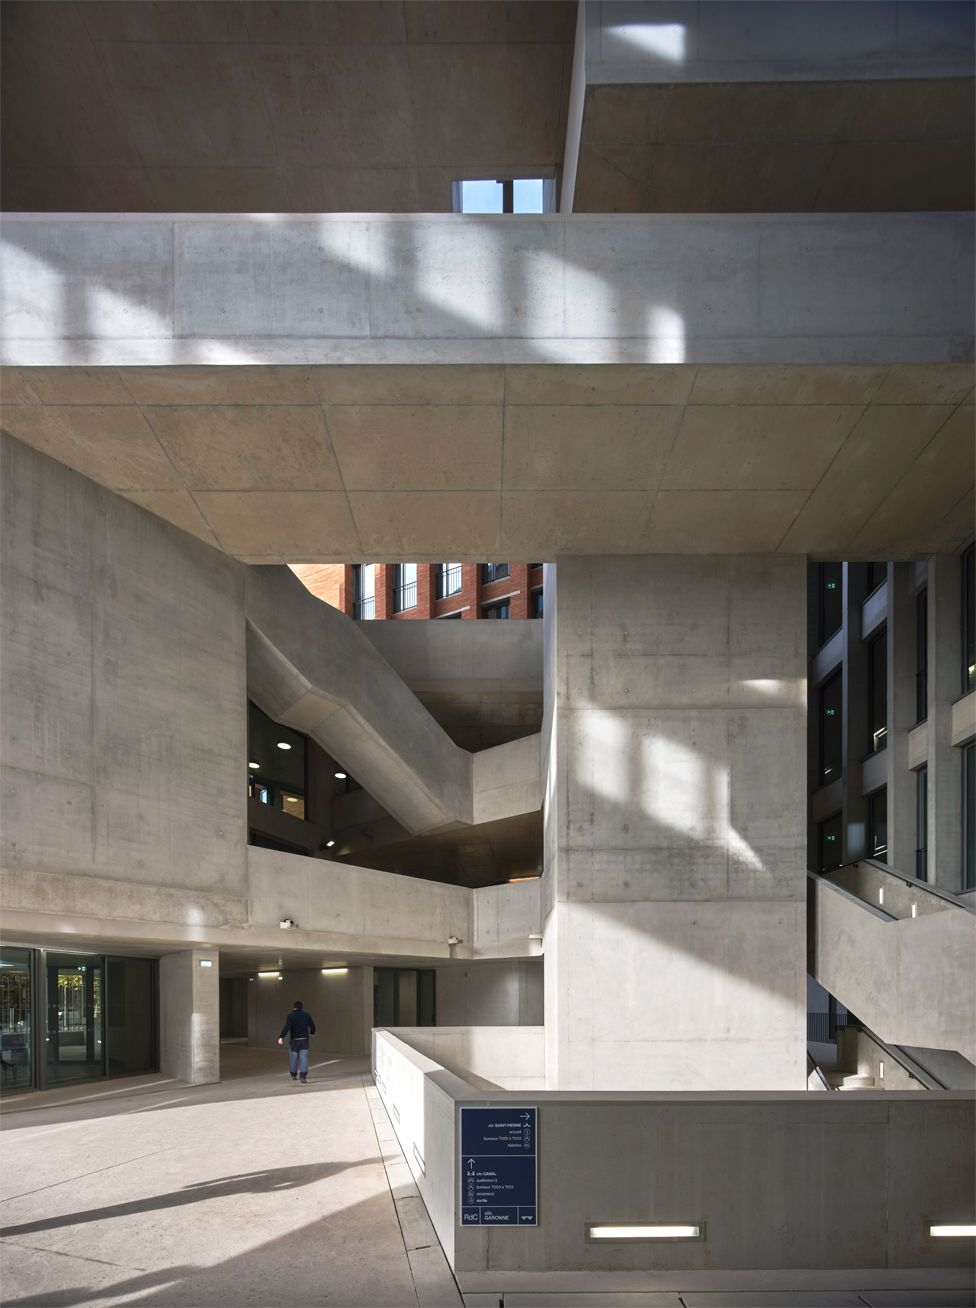 Escuela de Economía de la Universidad de Toulouse I Capitole, en Toulouse, Francia (2019)